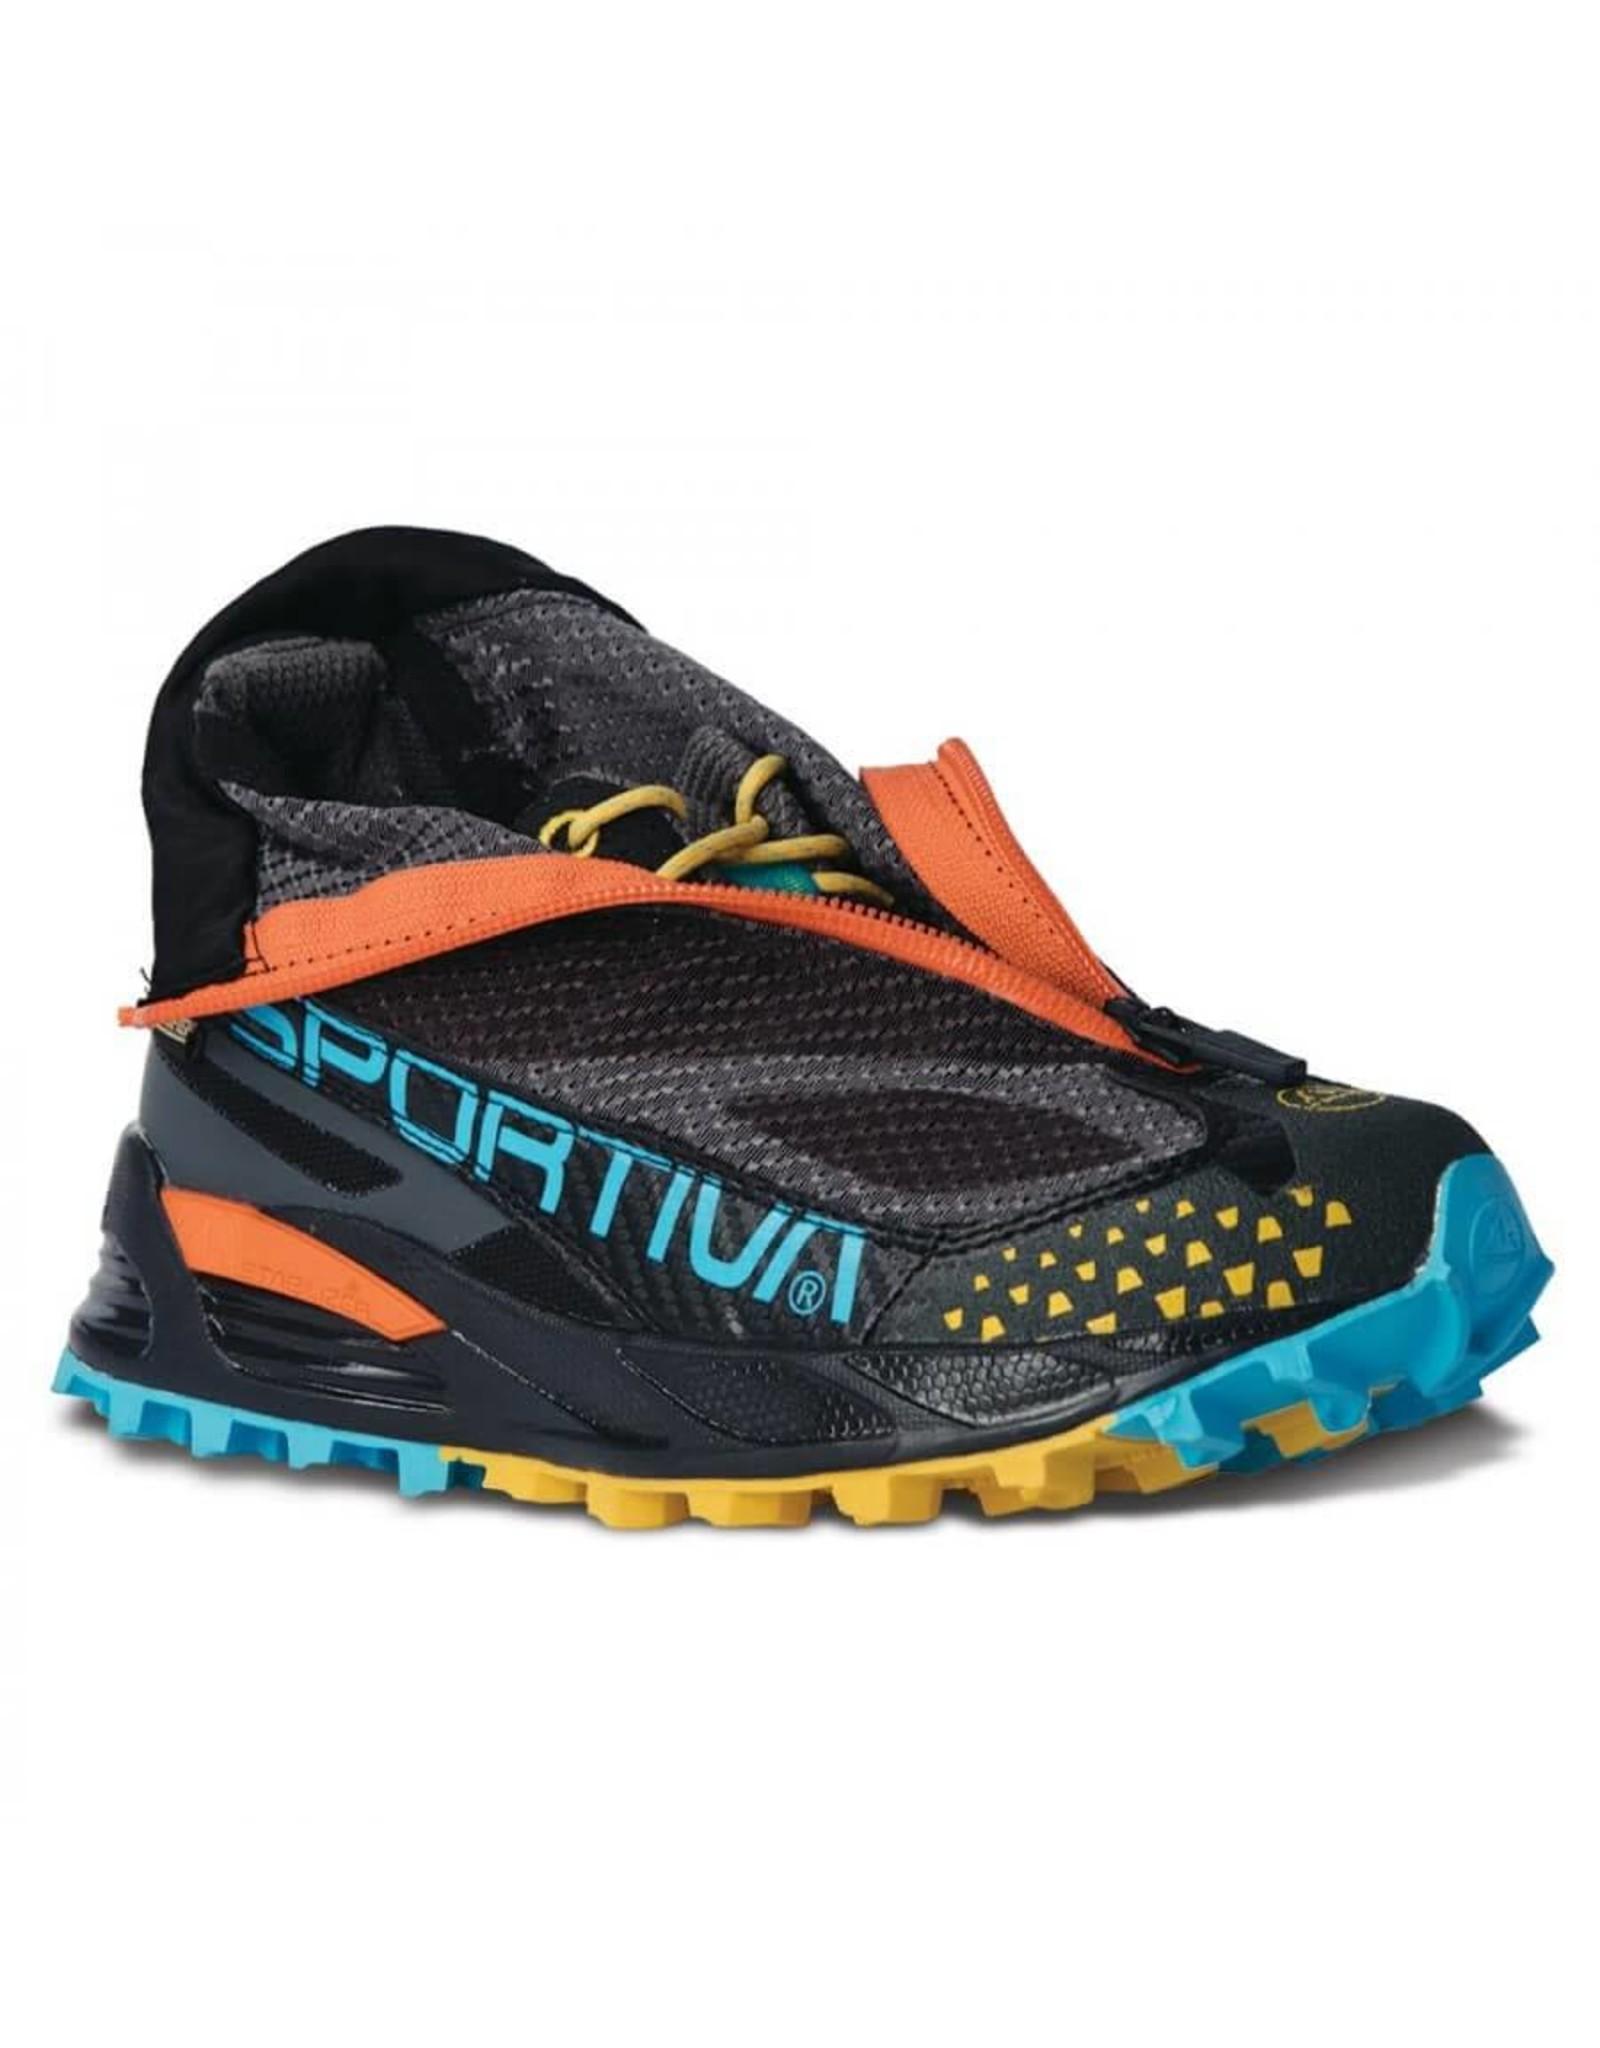 La Sportiva LaSportiva Crossover 2.0 GTX Women's Running Shoes